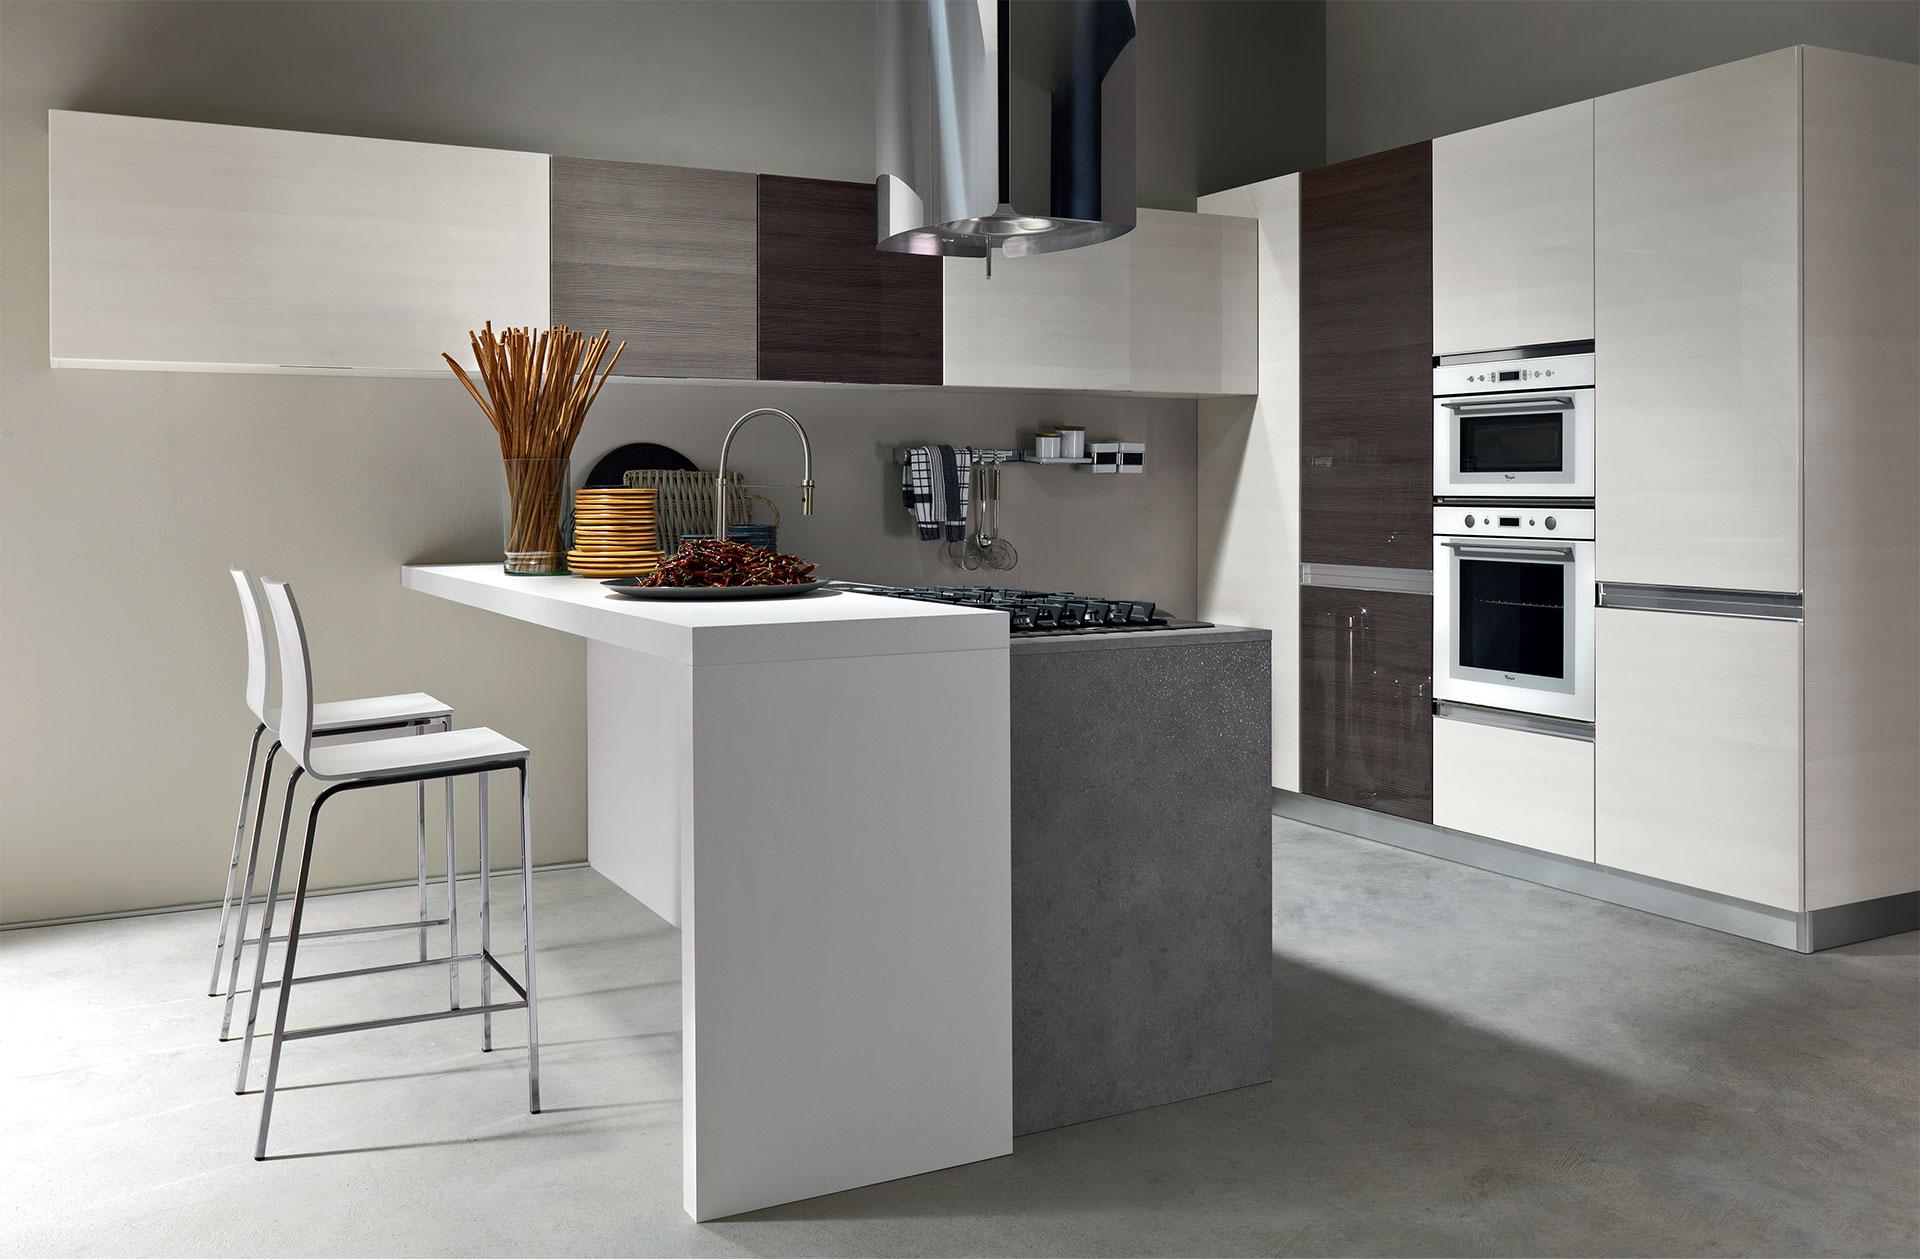 Cucina vela cucine moderne astra - Foto cucine moderne ...